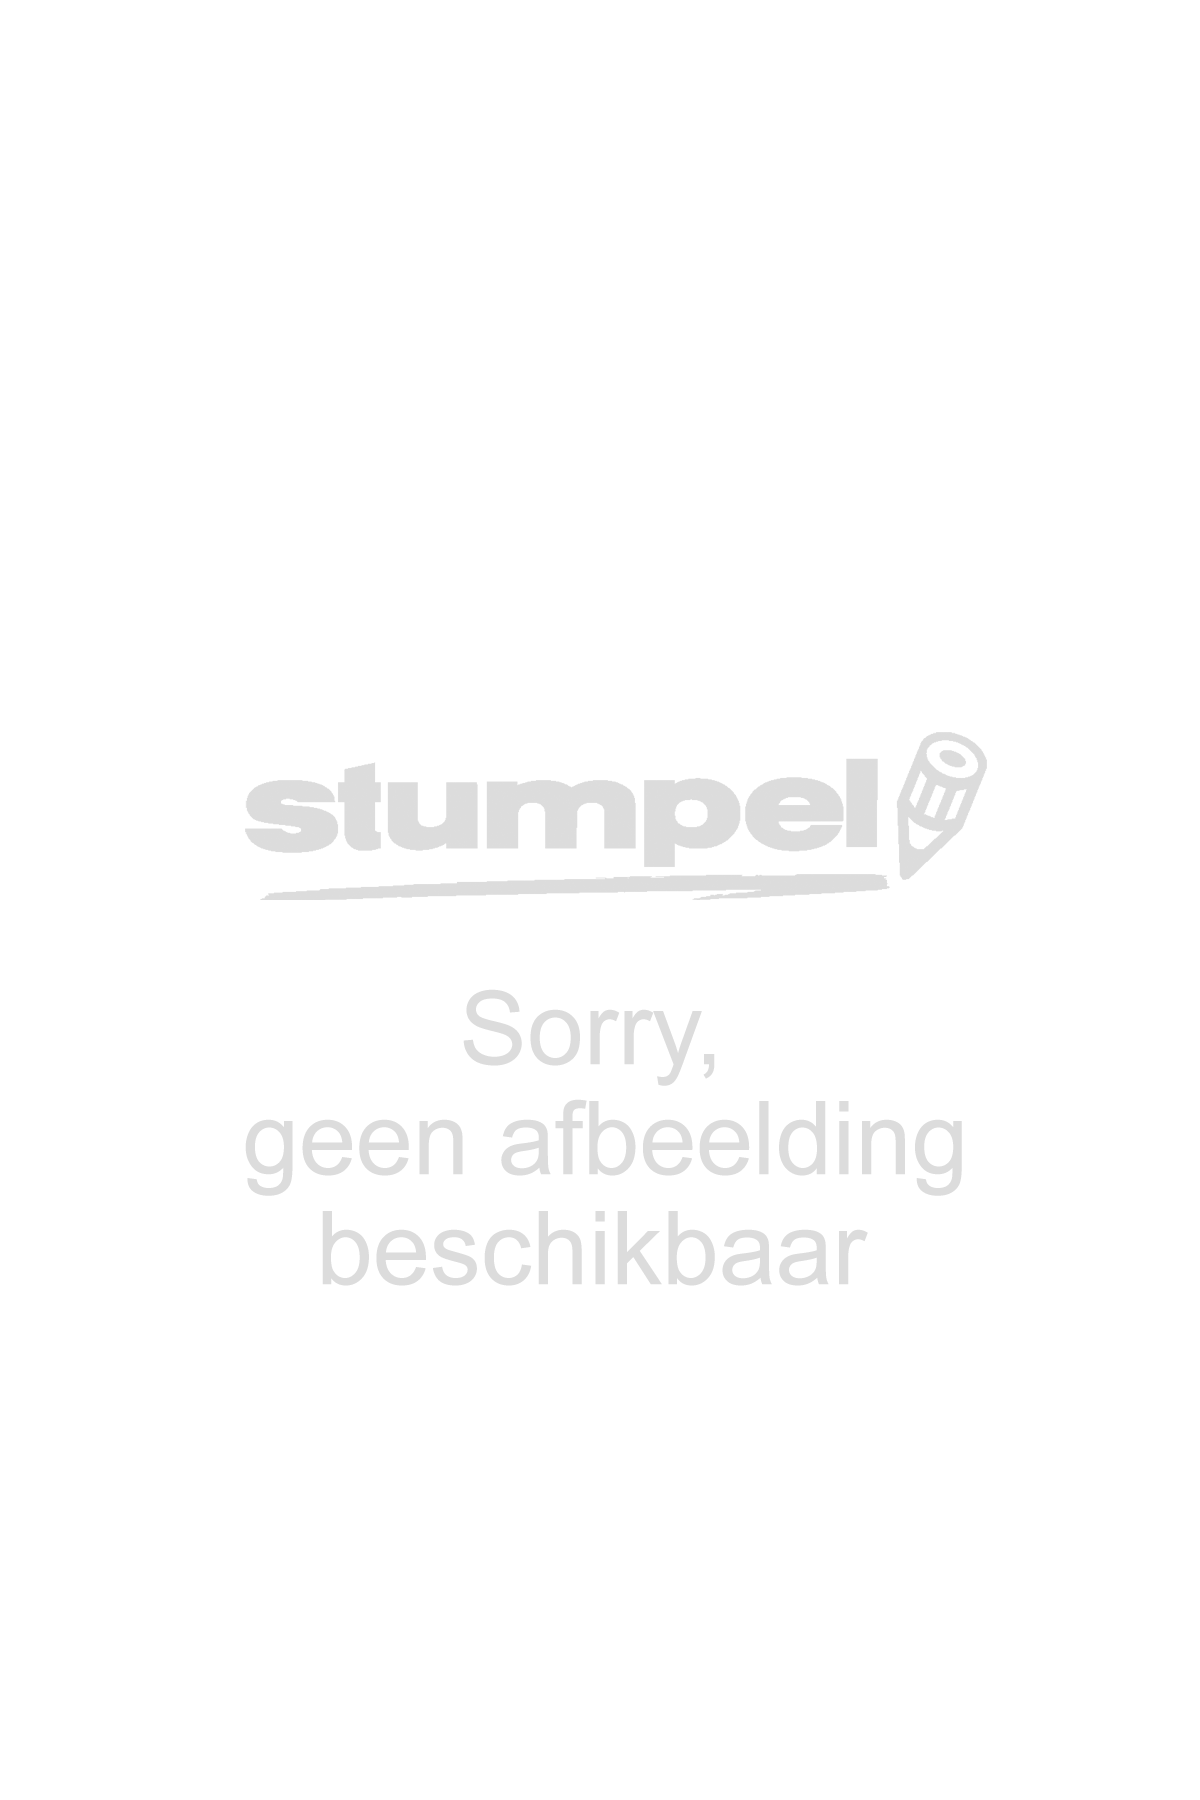 papierklem-doosje-a6-colibri-stationary-paperclip-10804101